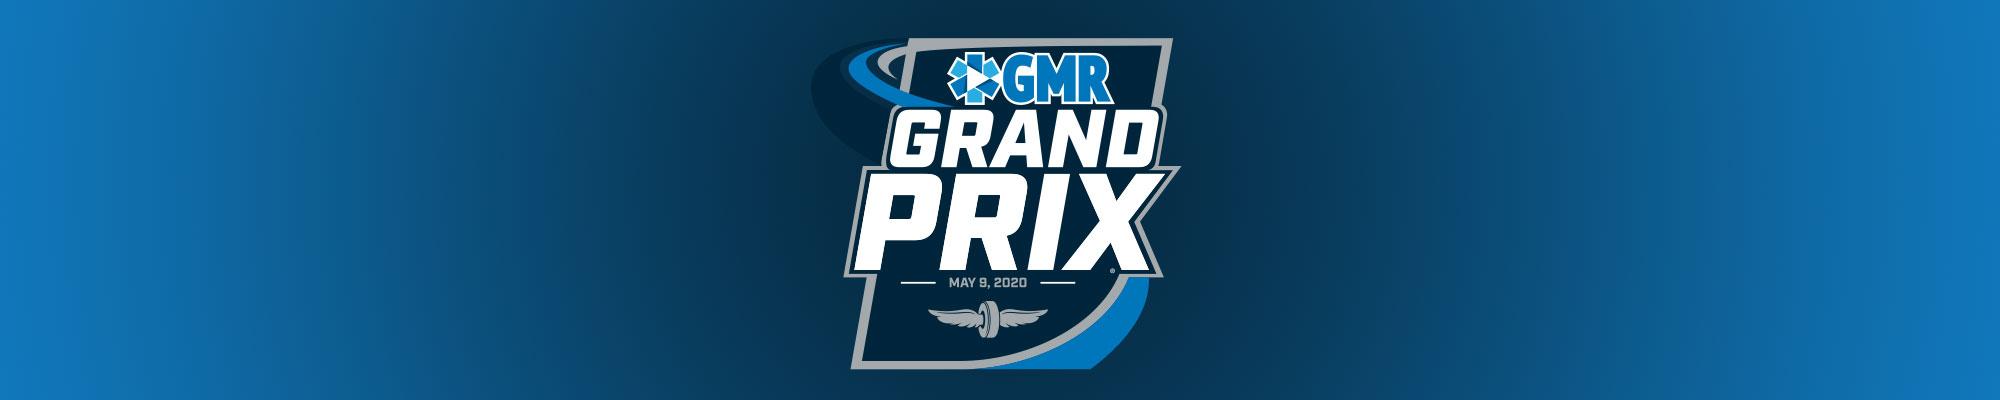 header-indycar-grand-prix-2020.jpg